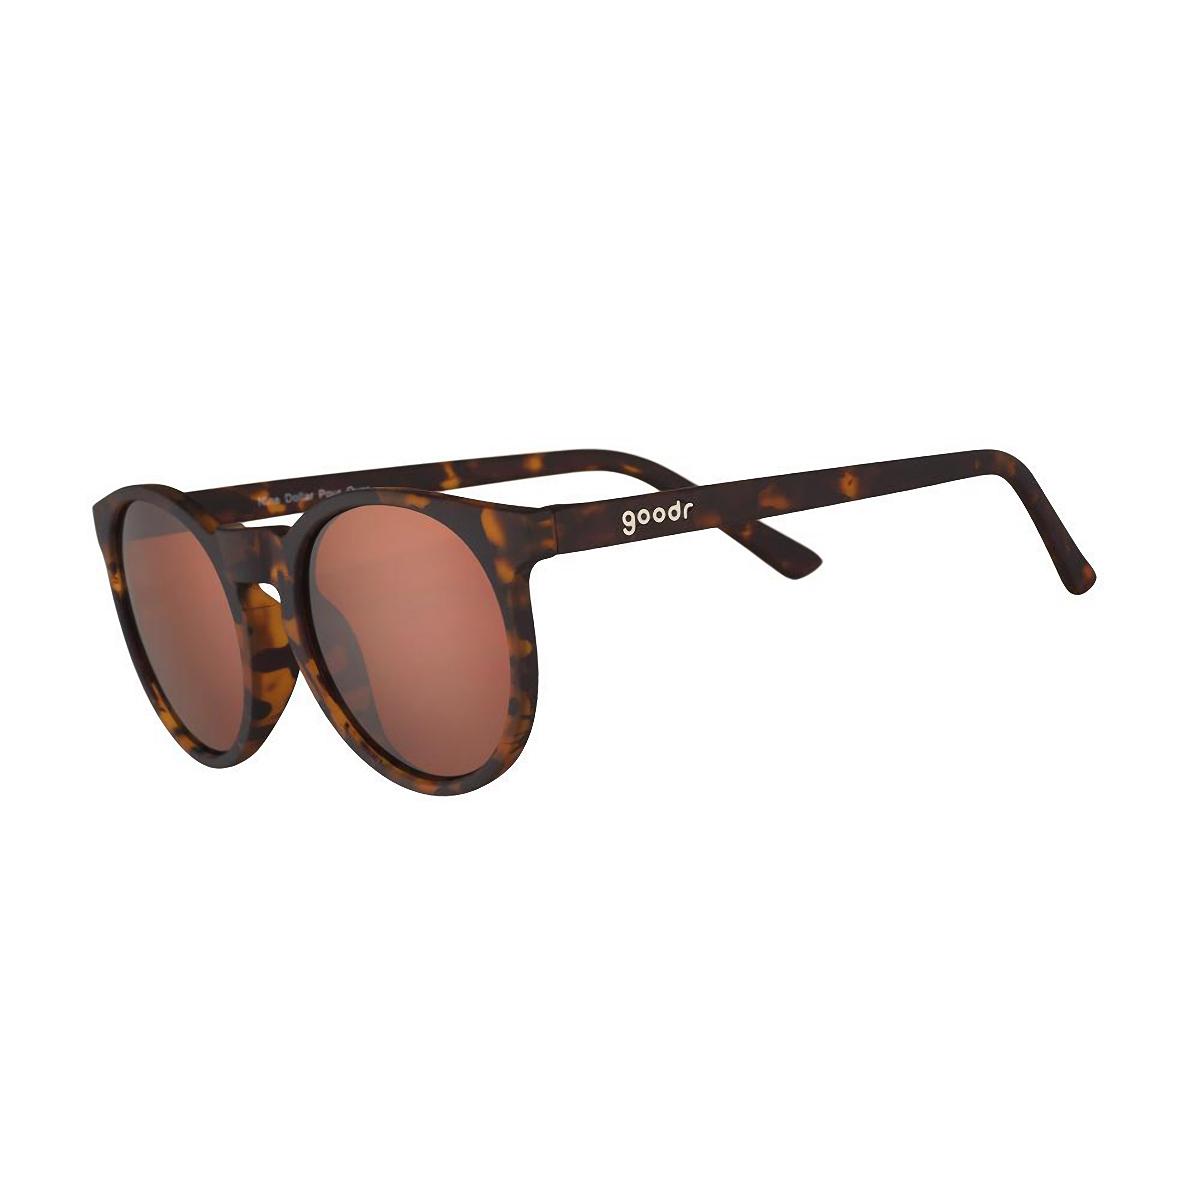 Goodr Nine Dollar Pour Over Sunglasses - Color: Tortoise - Size: OS, Tortoise, large, image 1